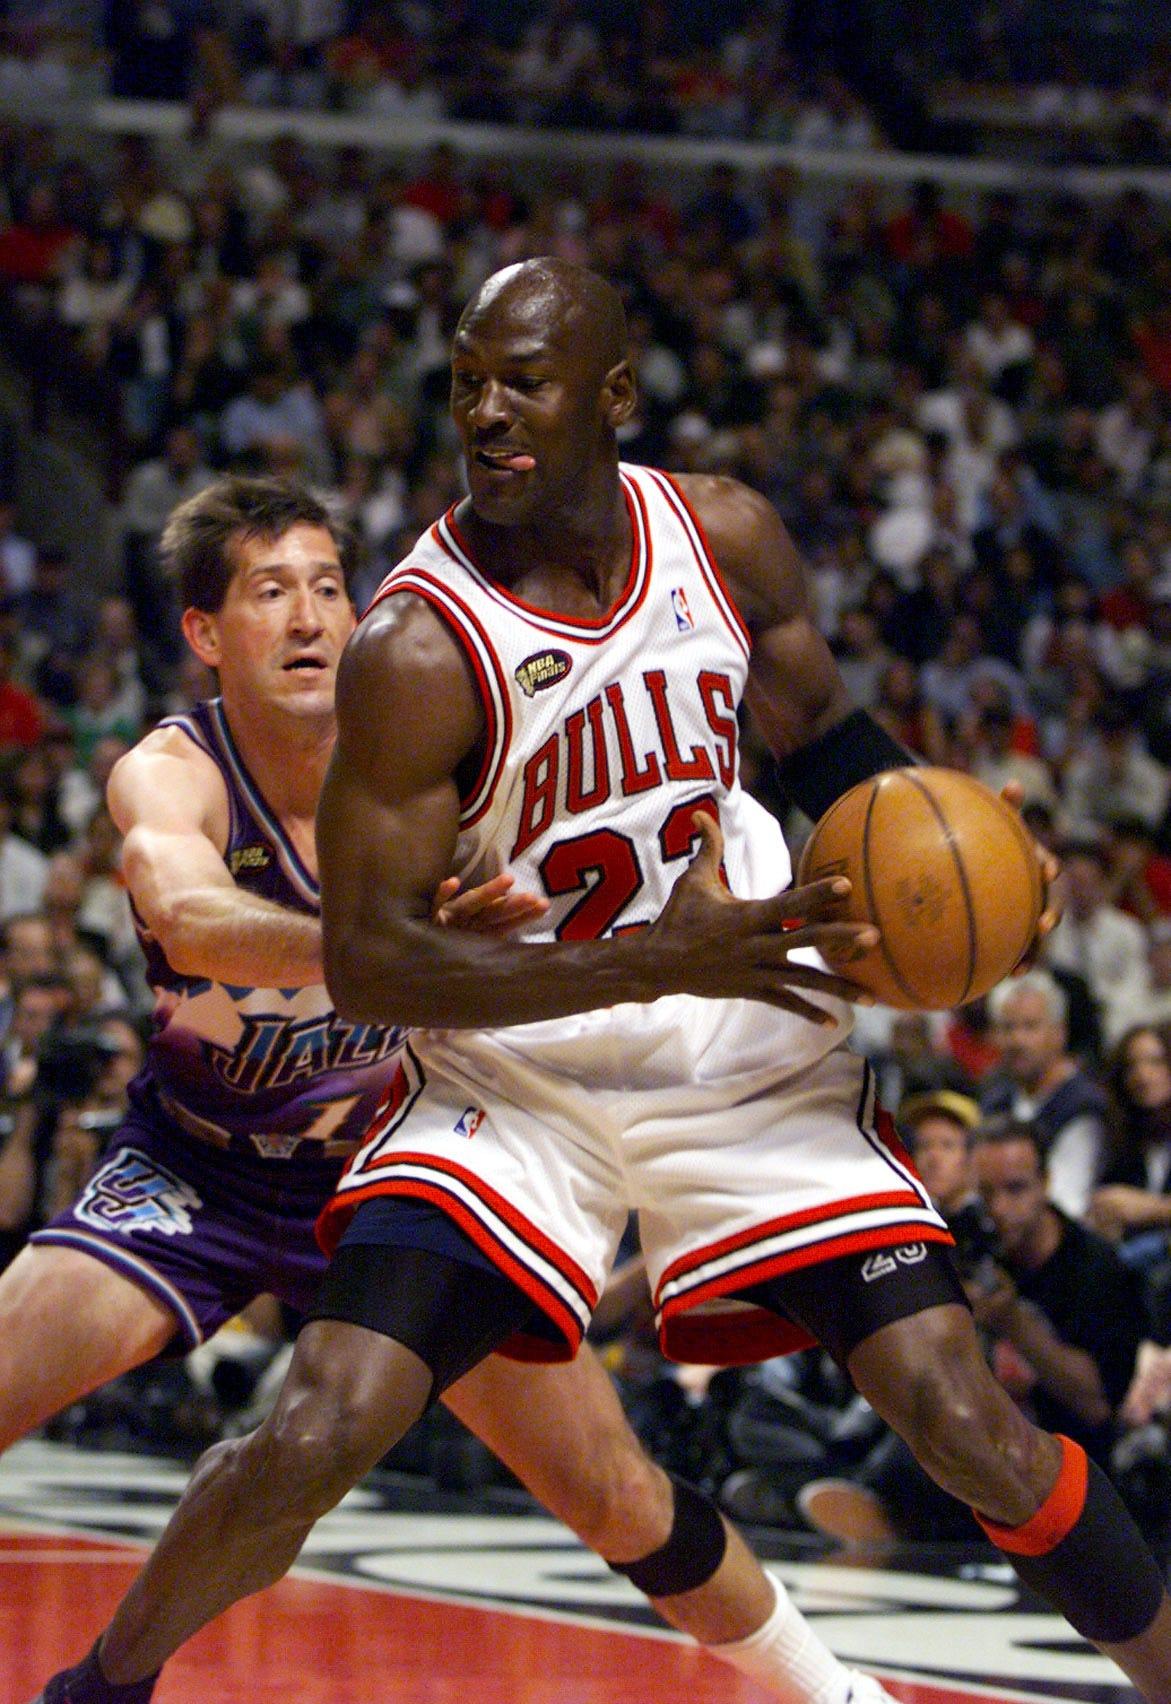 Michael Jordan's regular season NBA debut ticket sold for nearly $25,000